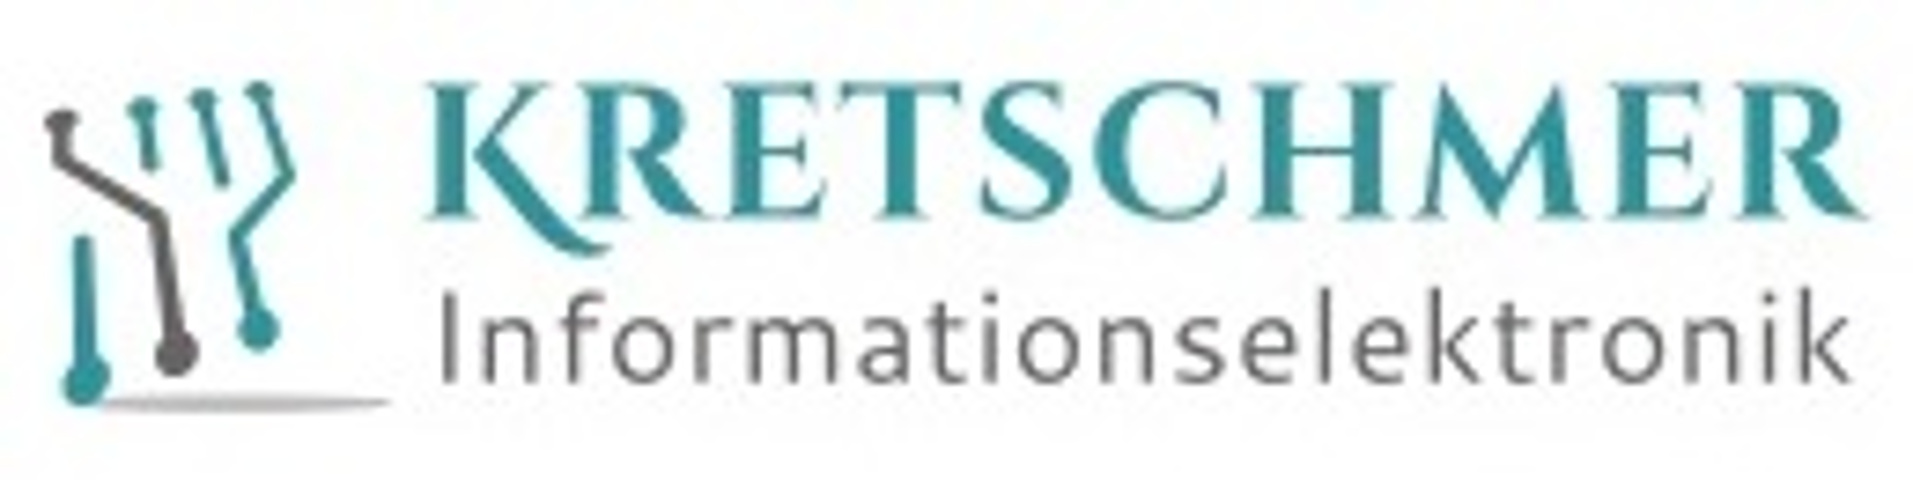 Kretschmer Informationselektronik GmbH